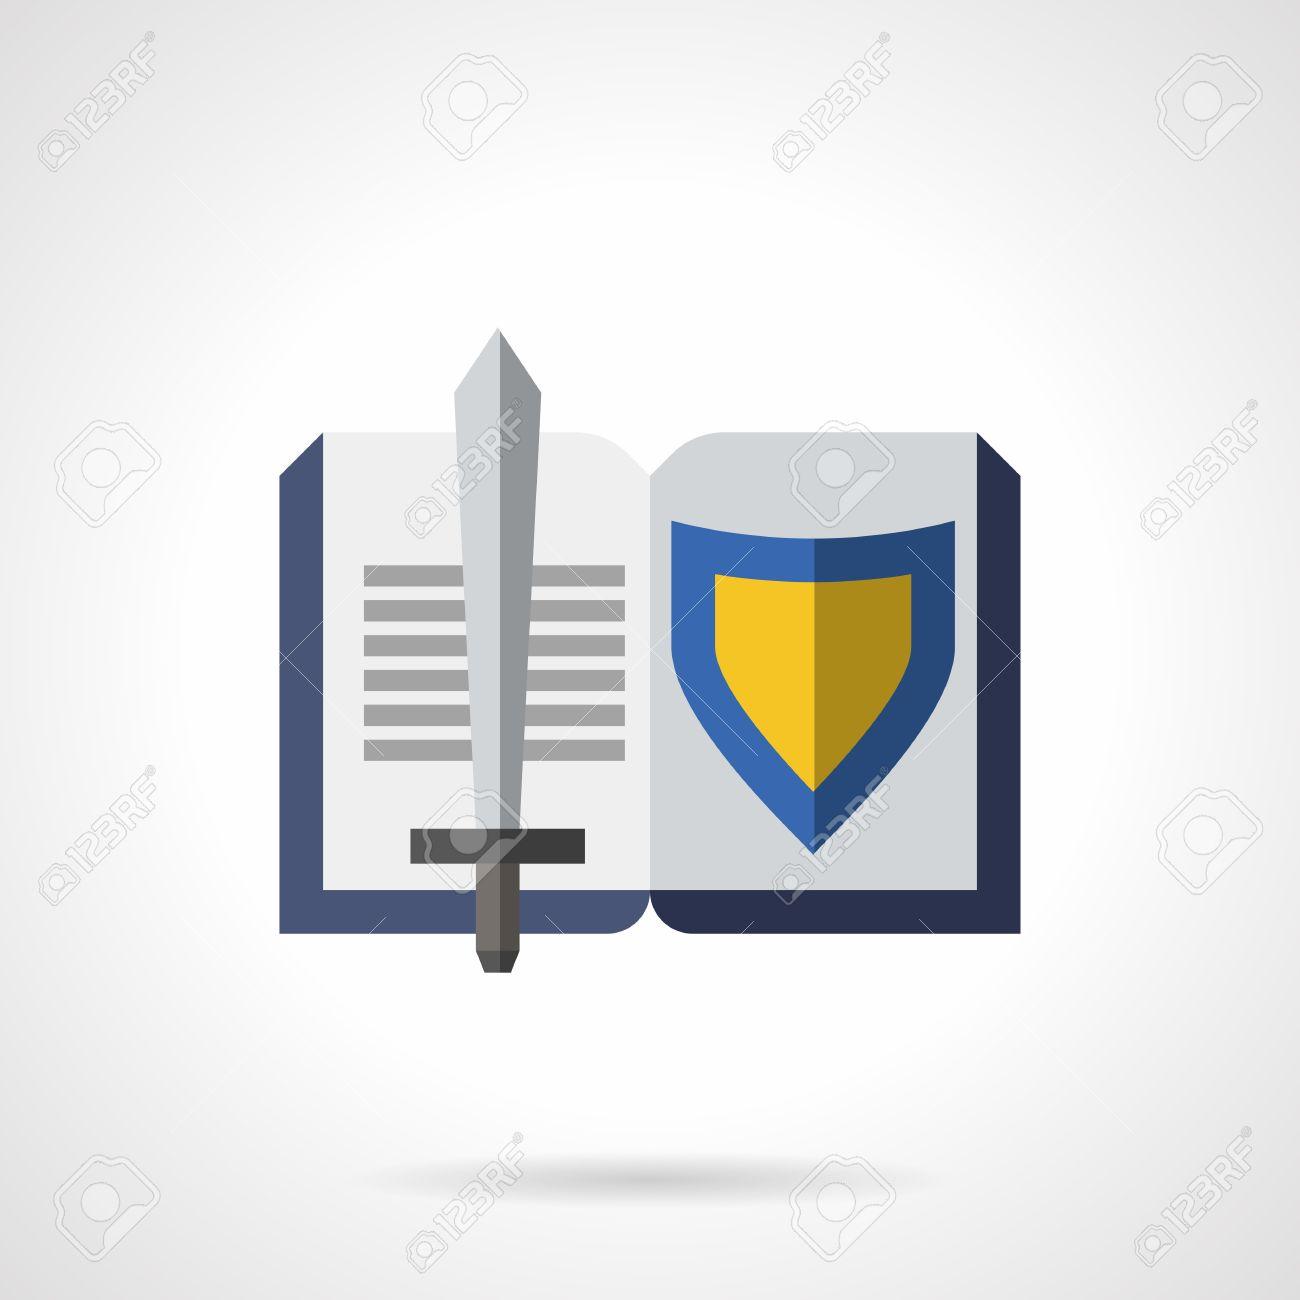 literature genres symbol open book sword and blue and yellow literature genres symbol open book sword and blue and yellow shield historical fiction